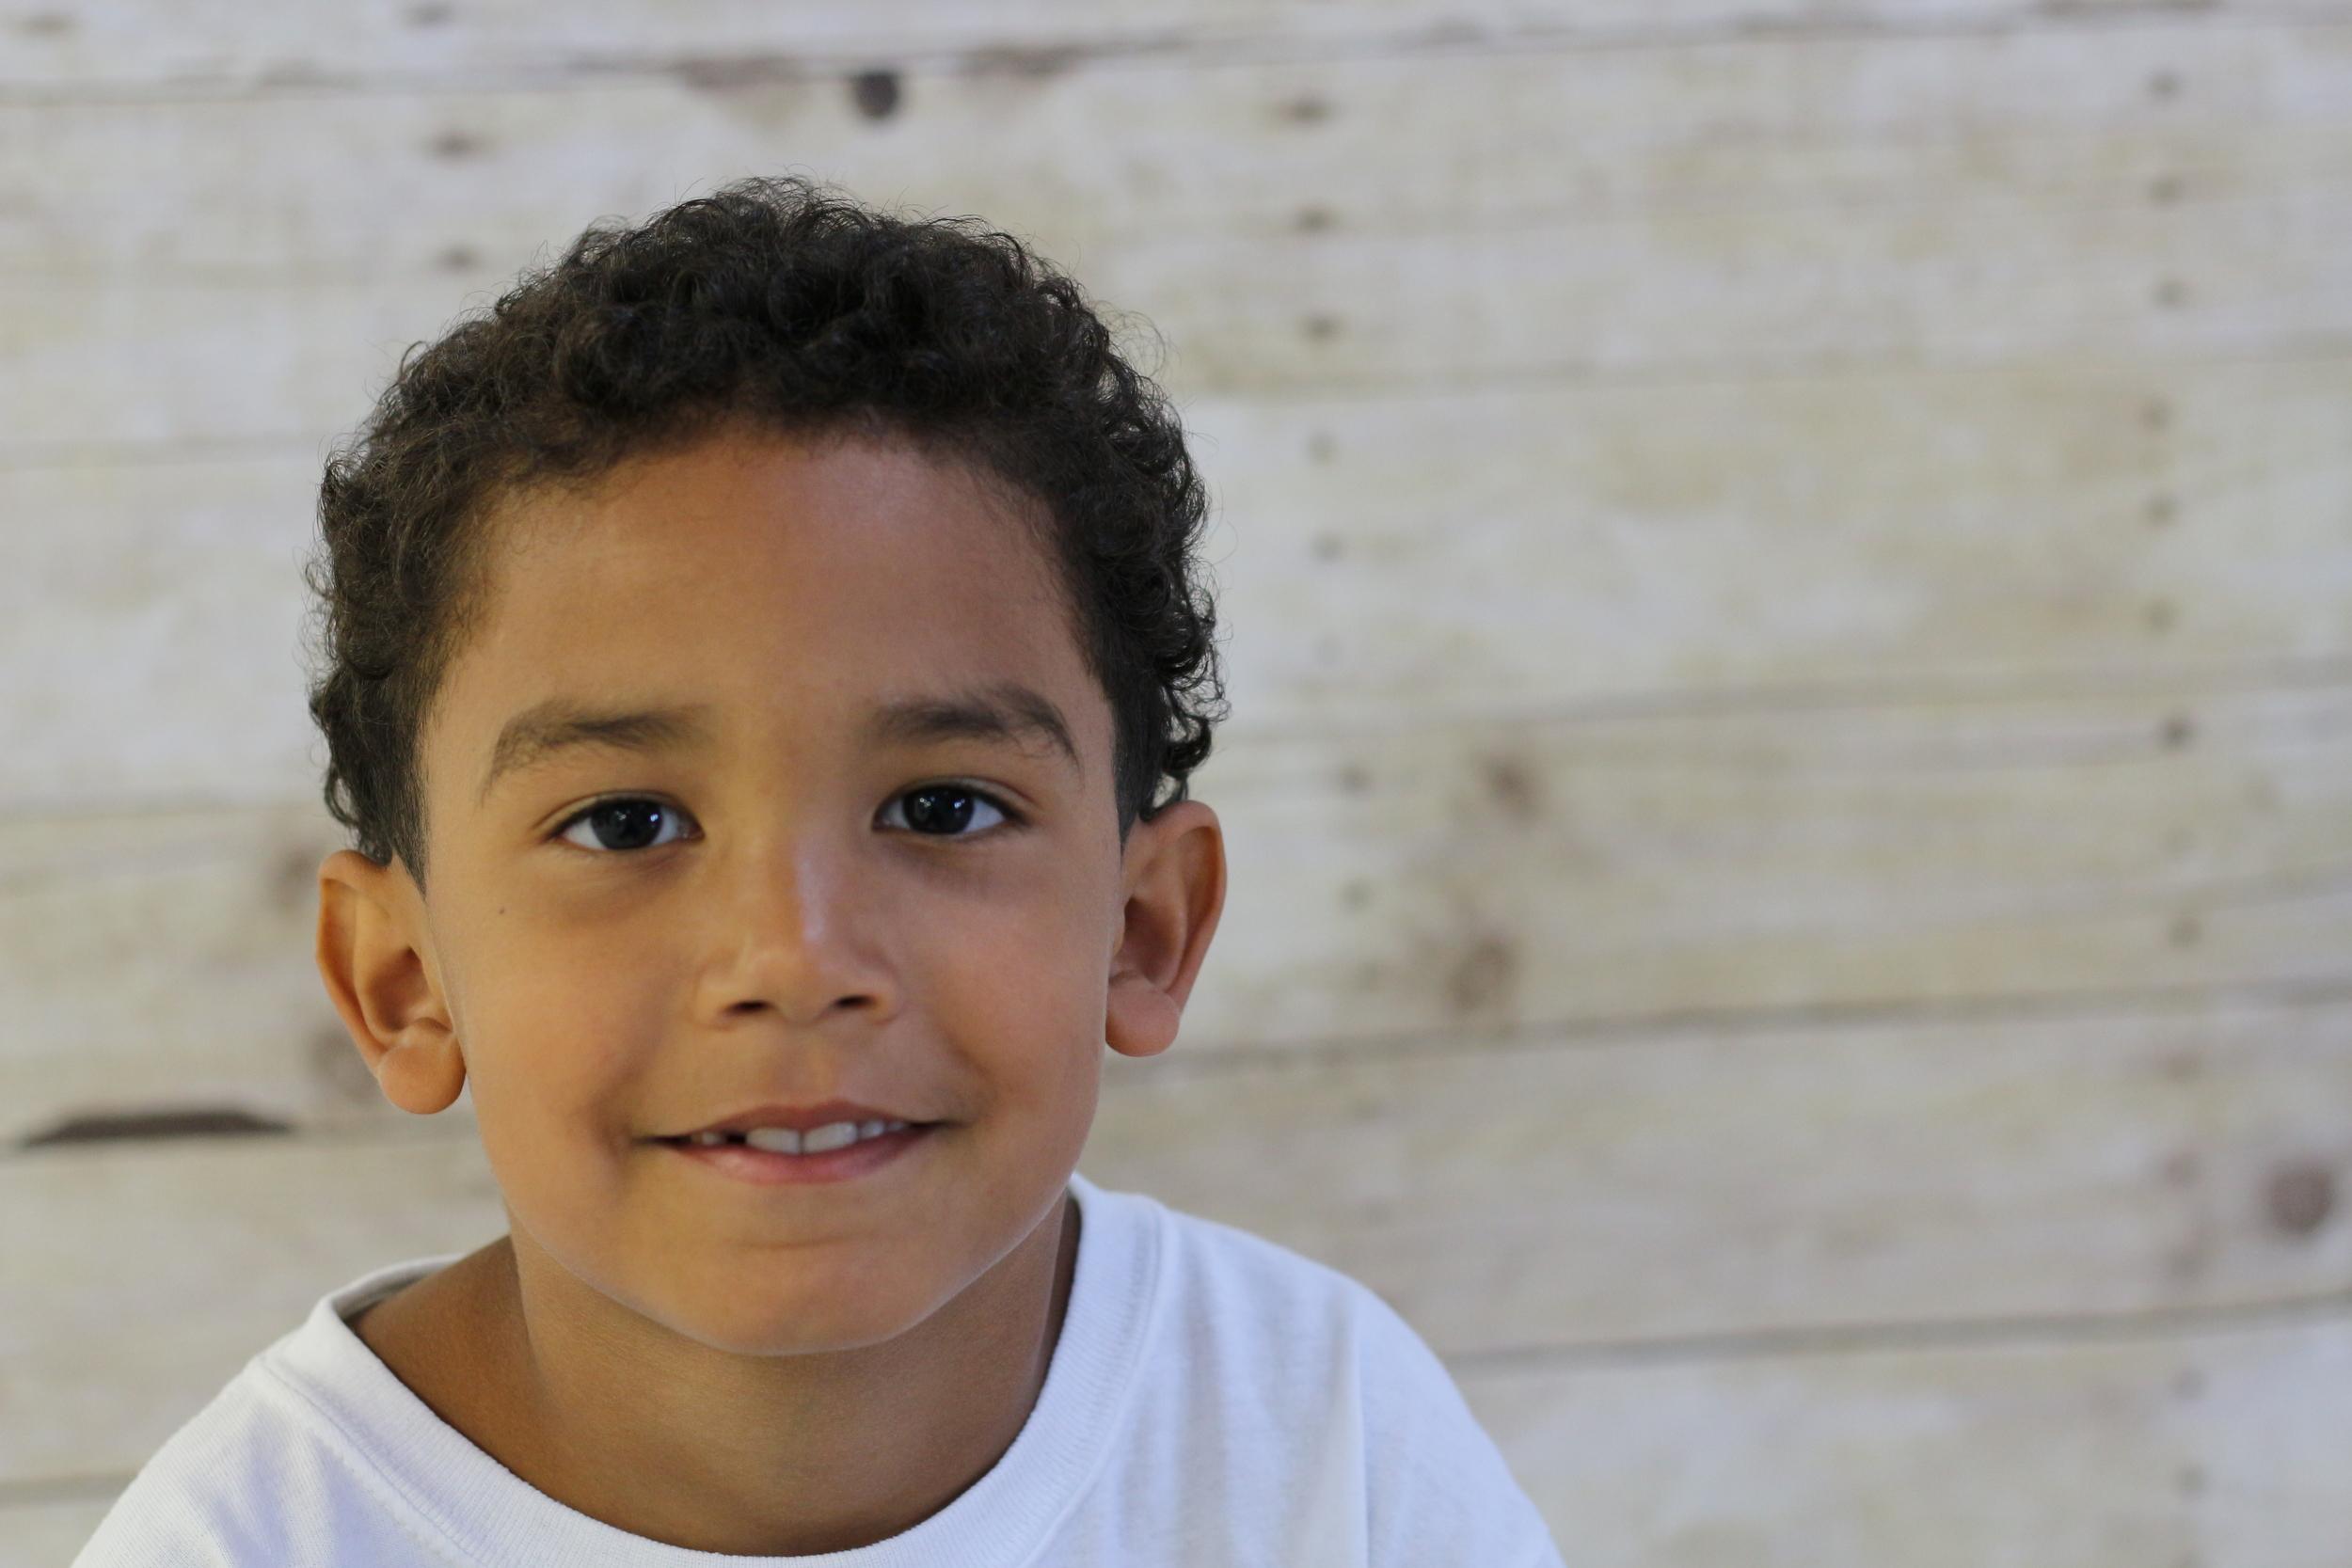 Jacob, age 8, West Milford, NJ